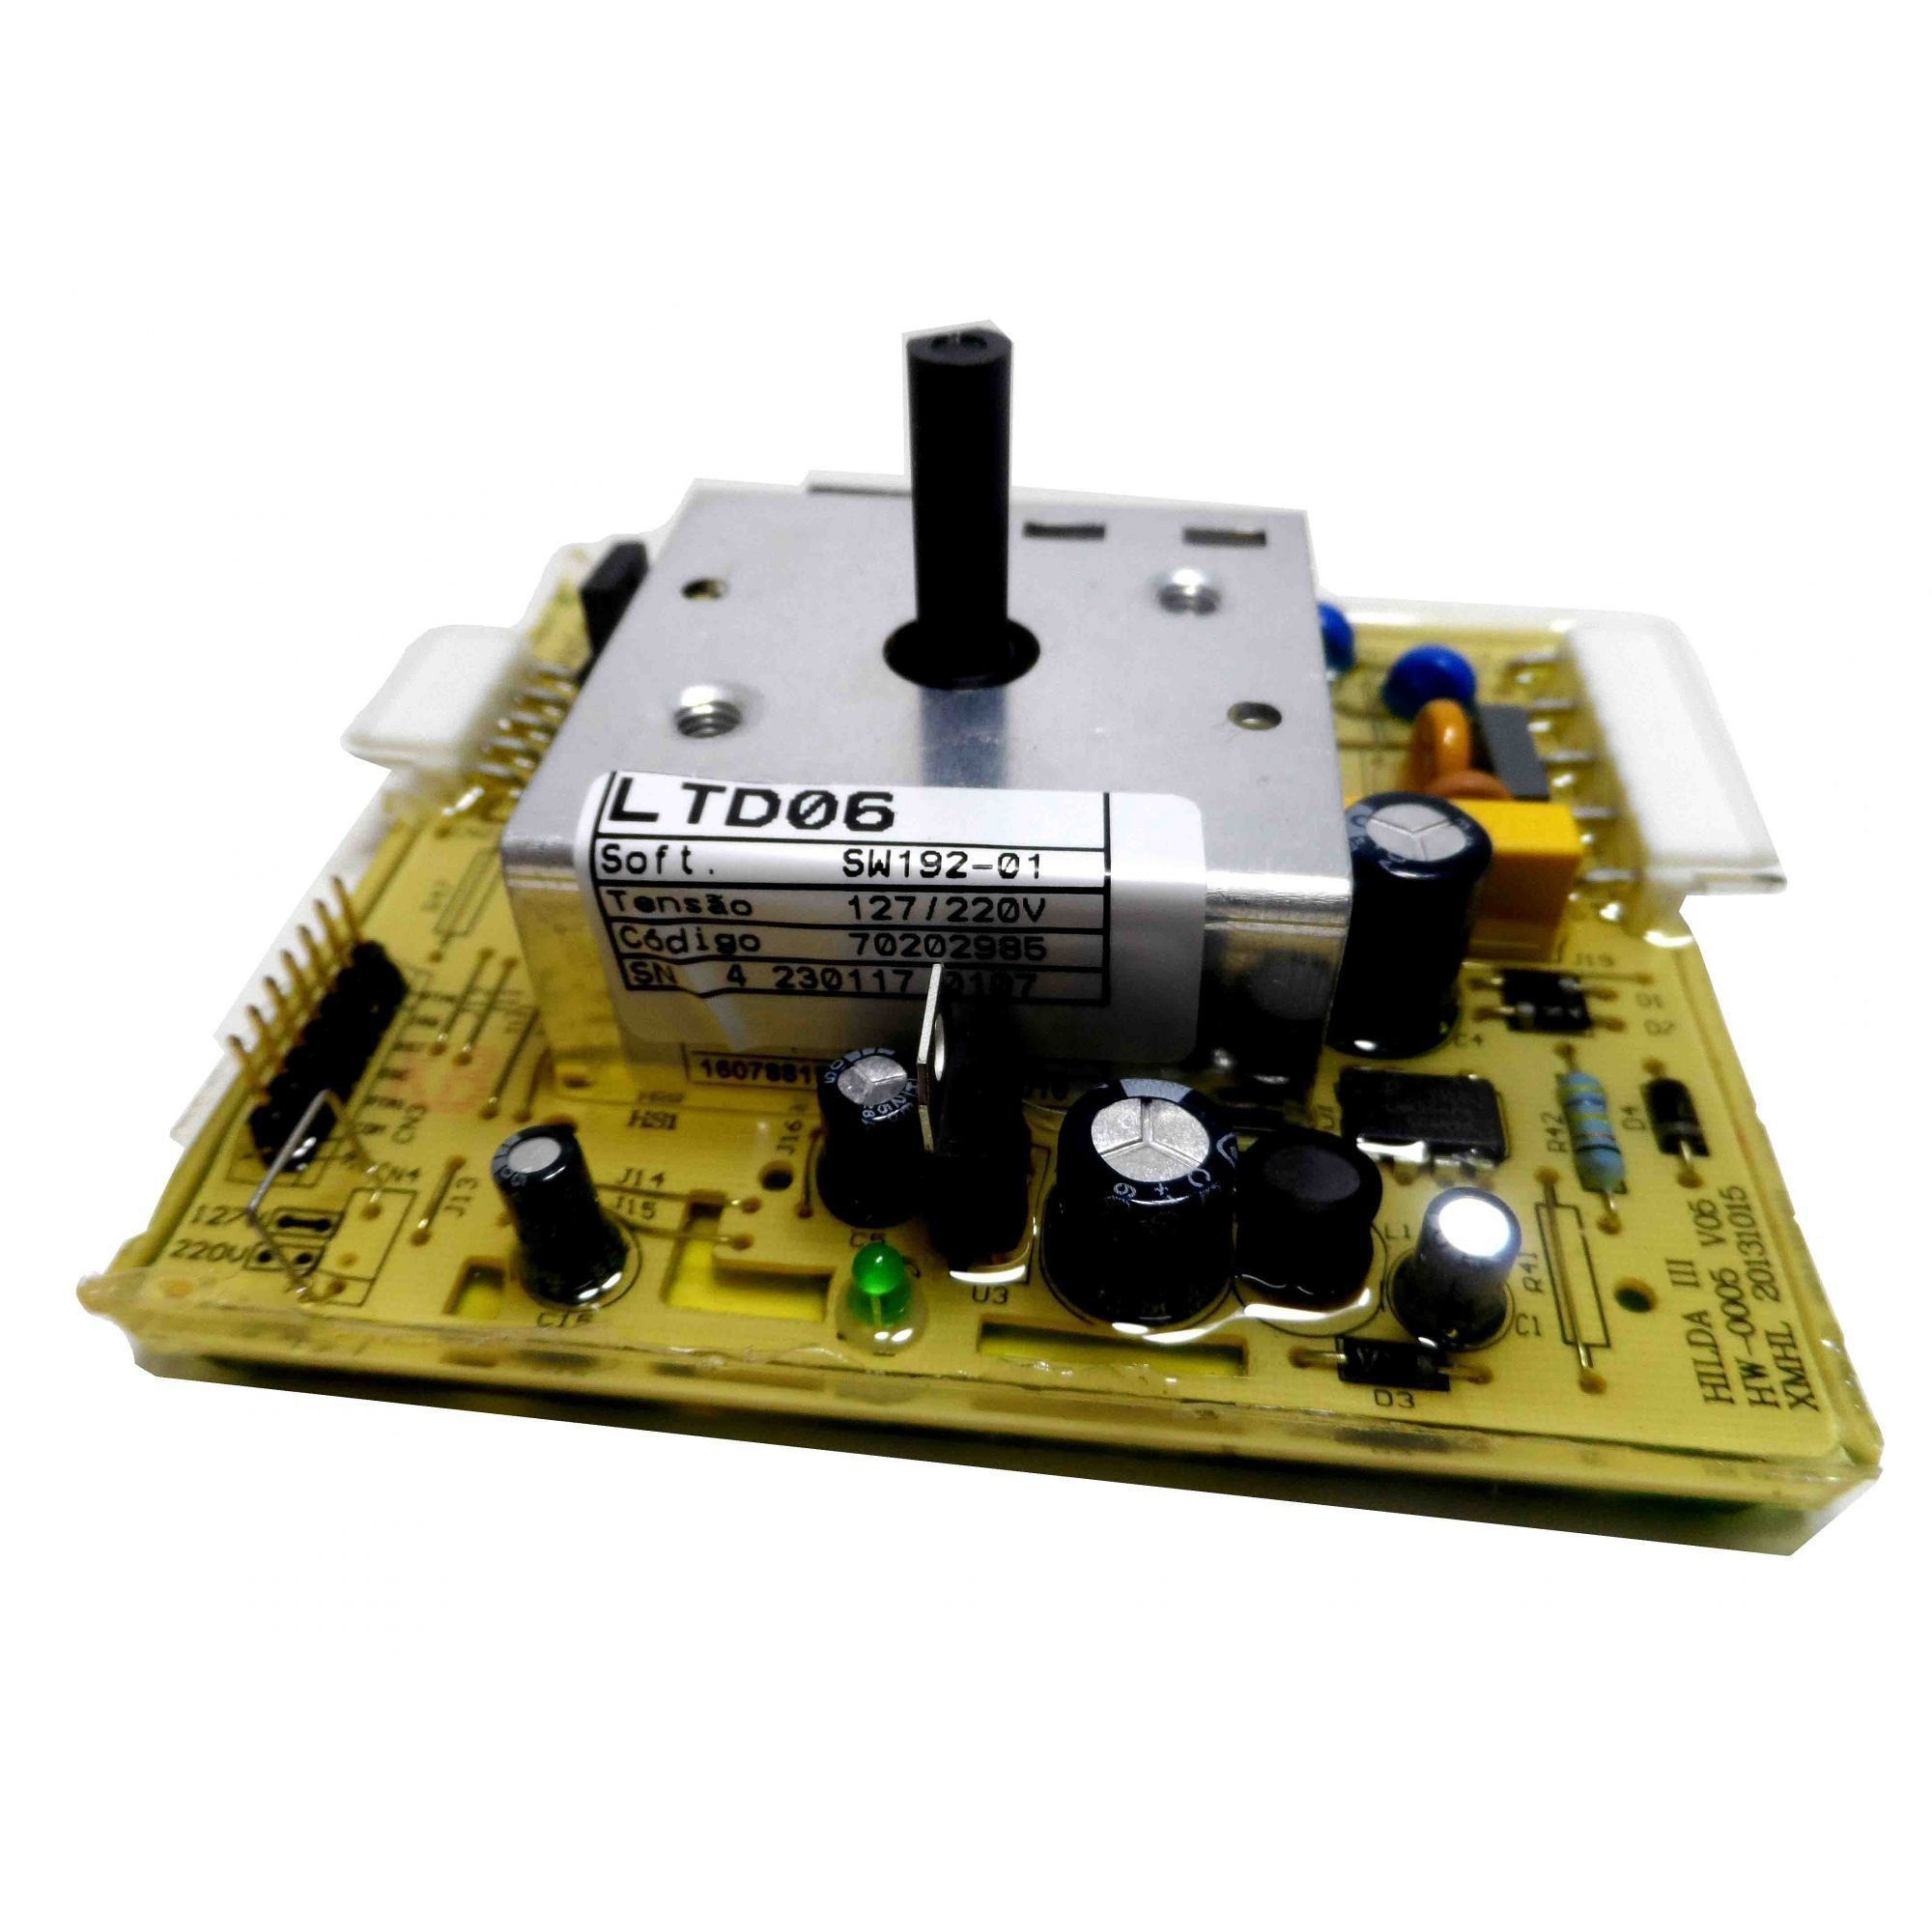 Placa Eletrônica Potência Lavadora Electrolux Top Load 70202985